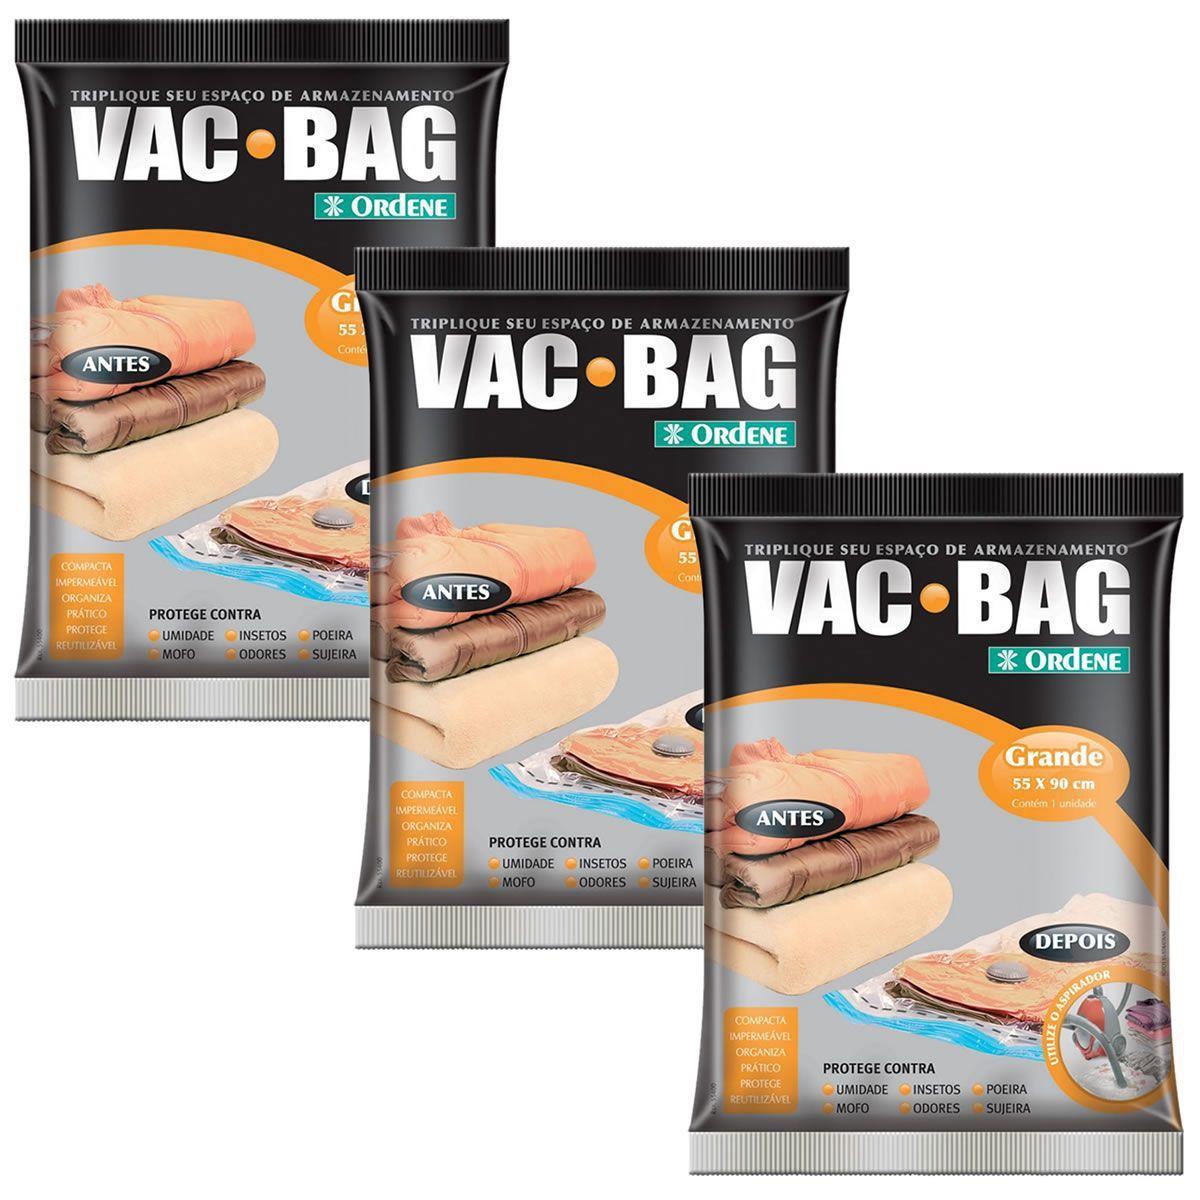 3 Saco A Vacuo Vac Bag Ordene Grande 55x90 Edredom Cobertas Saco A Vacuo Magazine Luiza